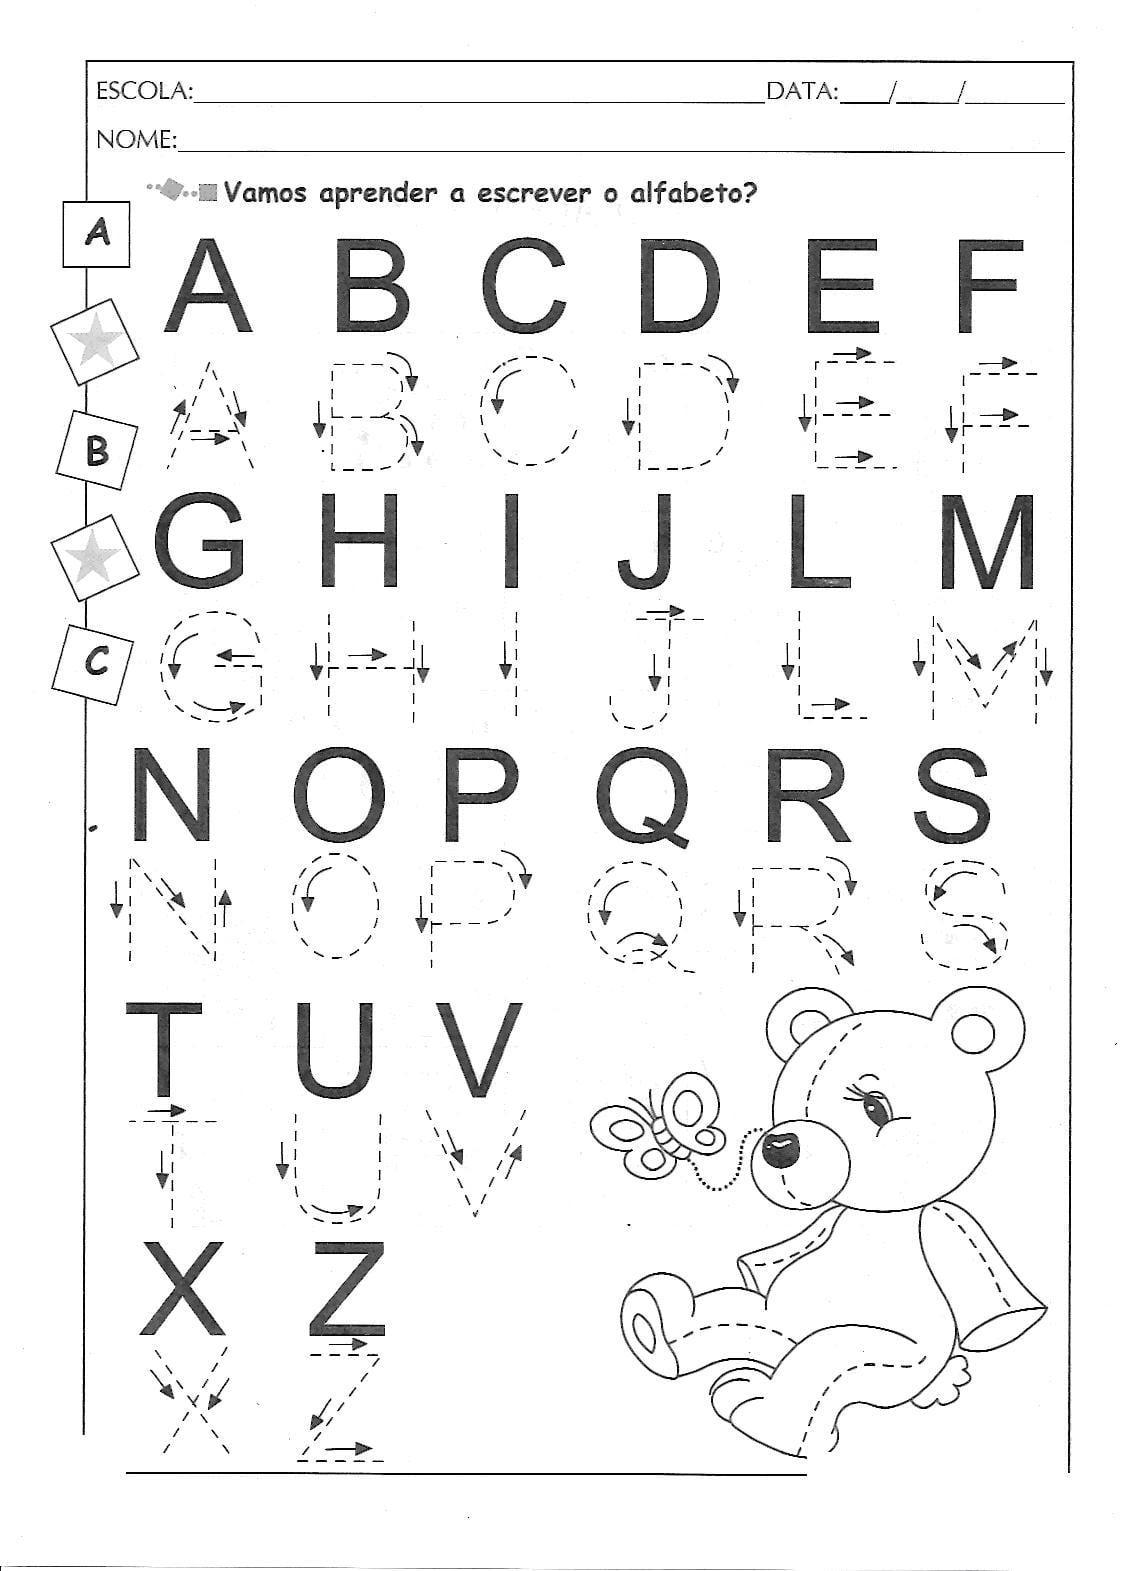 Alfabeto Pontilhado Ilustrado Para Imprimir — SÓ Escola